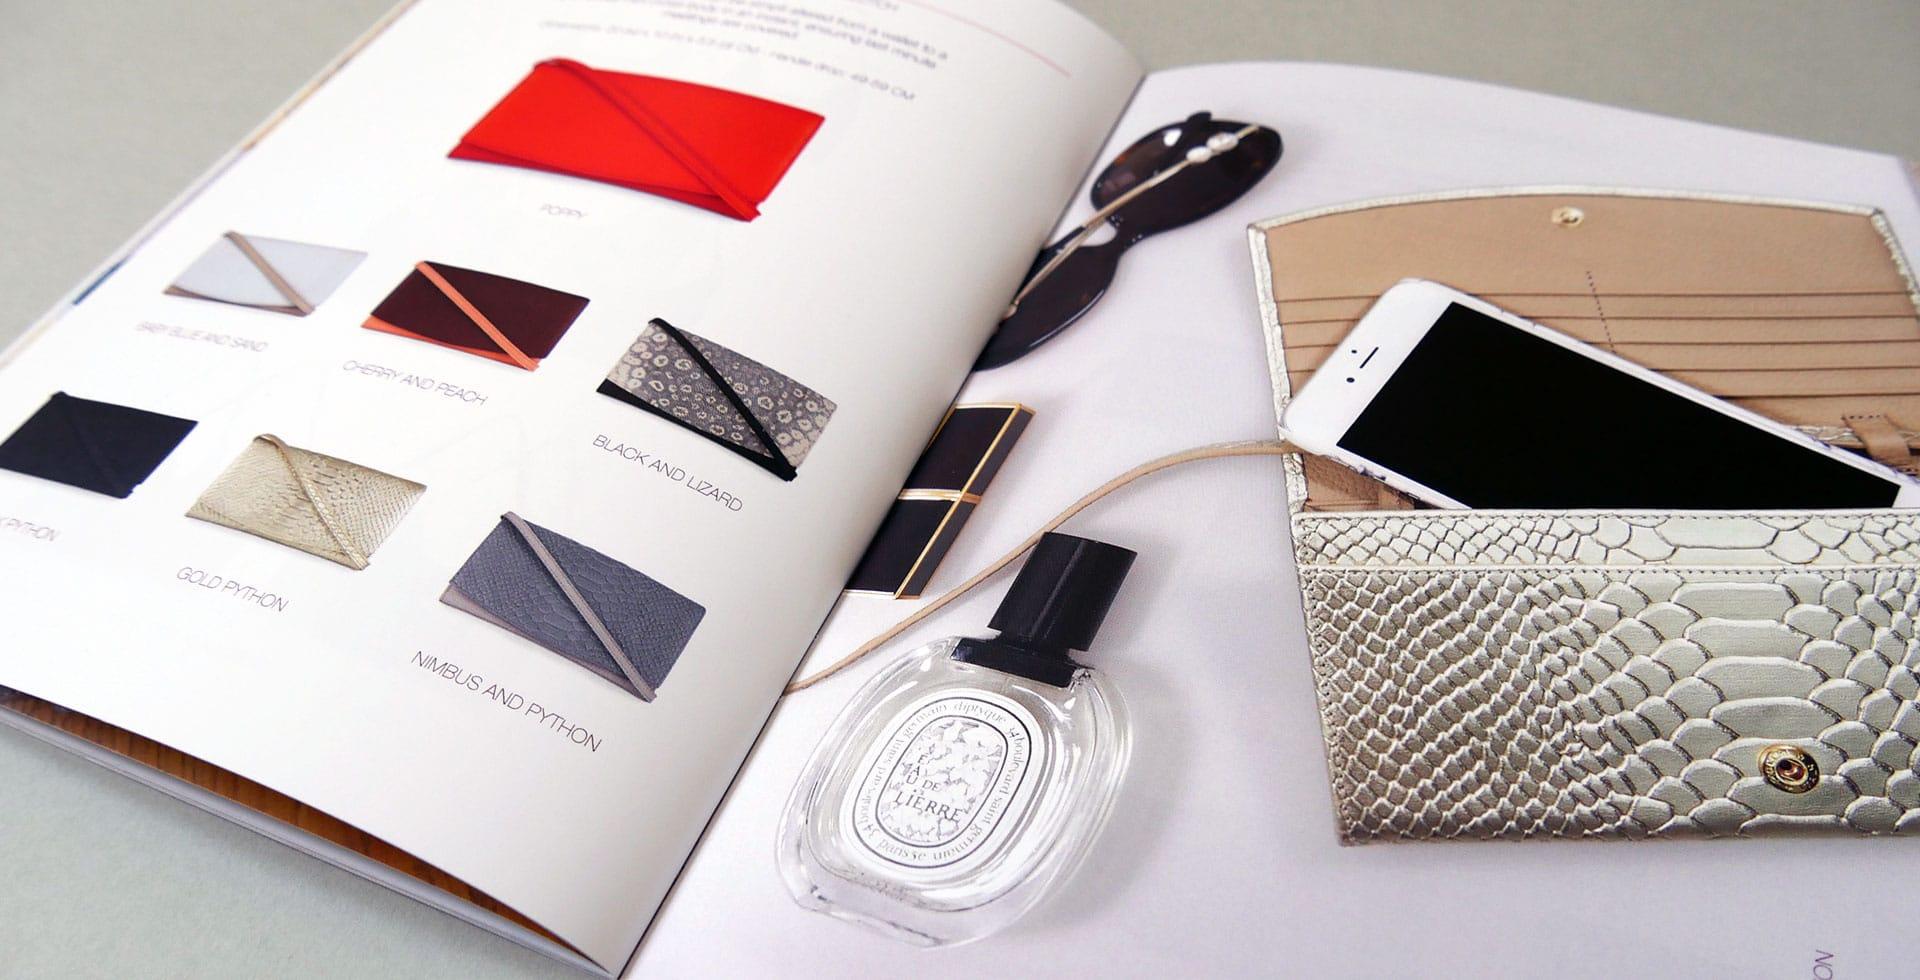 Esin Akan Lookbook page layouts